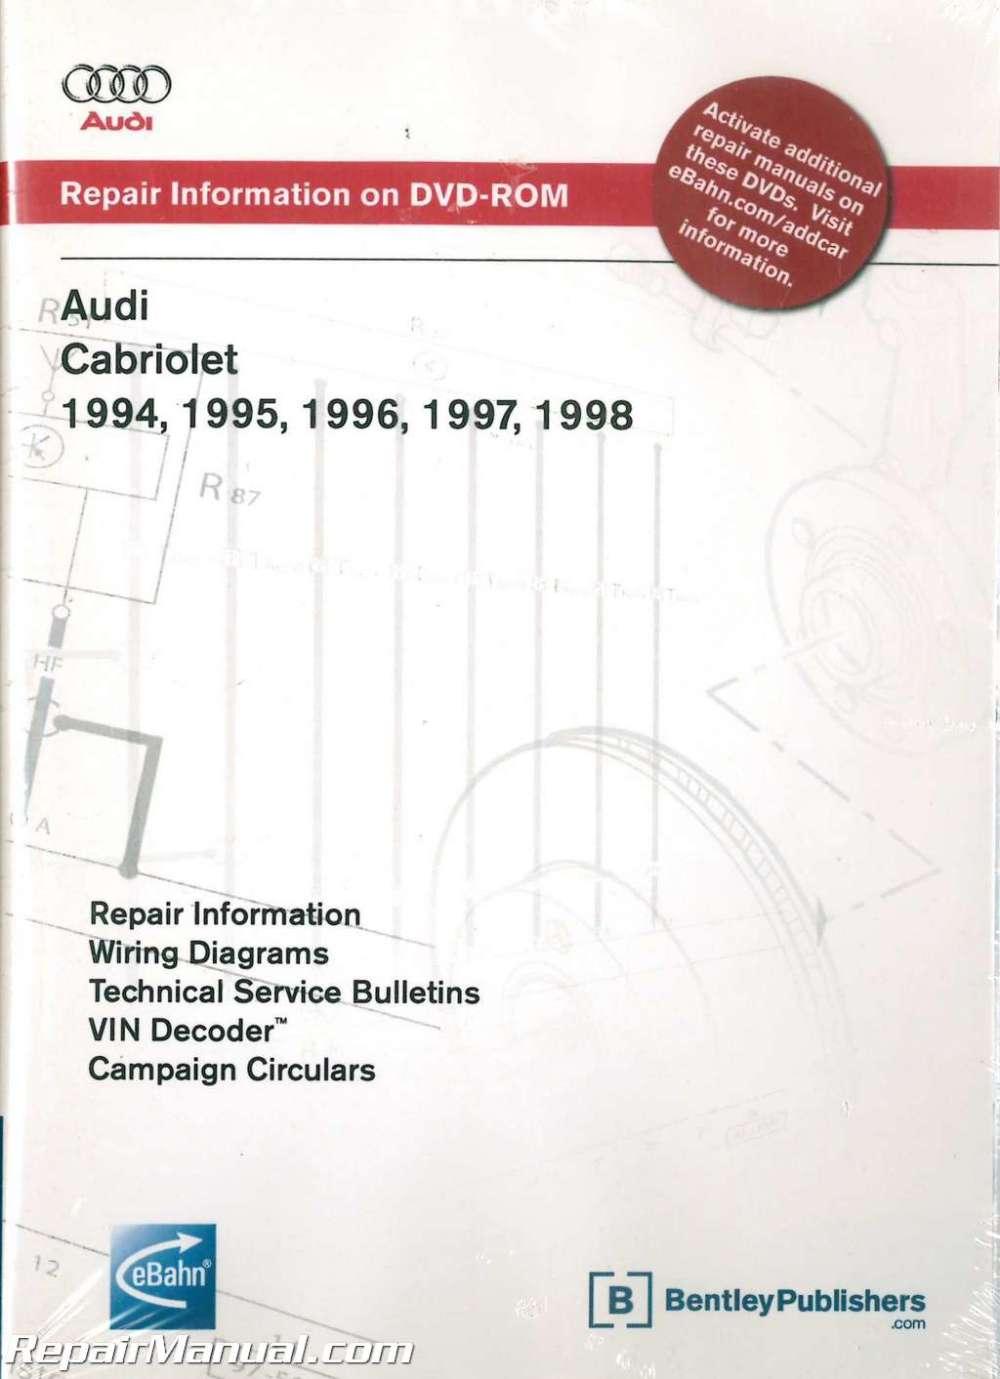 medium resolution of audi cabriolet 1994 1998 repair manual on dvd rom audi 80 cabriolet wiring diagram audi cabriolet wiring diagram